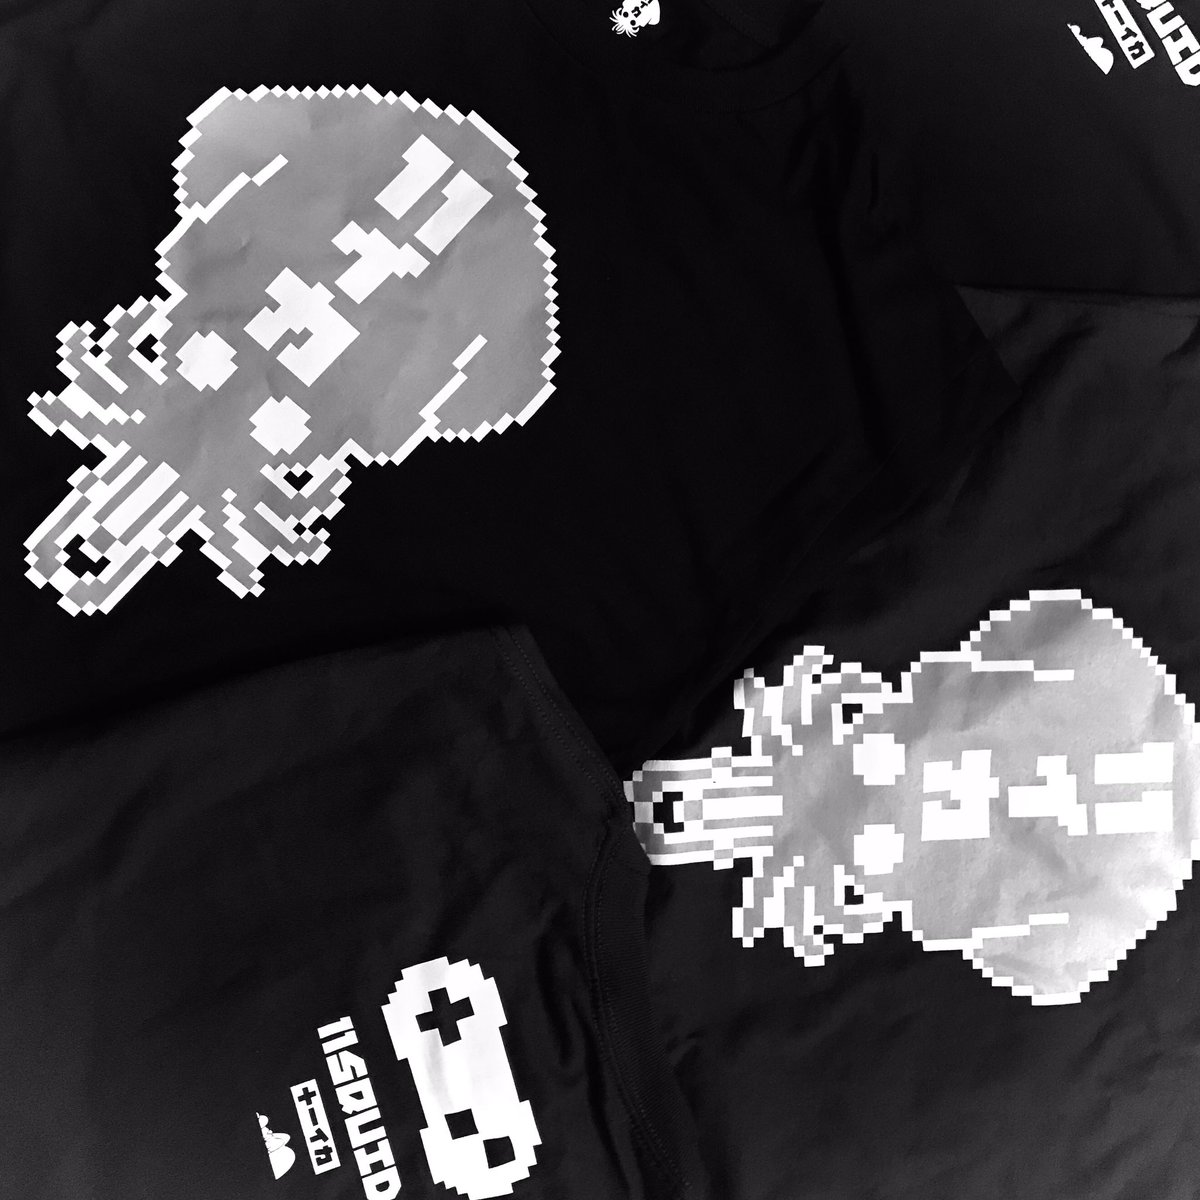 "8-bit swimming. 🦑🌊👾 Happy Aloha Friday!!! • ""8-Bit Logo"" t-shirts available on the 11SQUID online shop:  —- #11SQUID #8bitlogo #8bitsquid #pixelart #pixel #happyalohafriday #alohafriday #11イカ #tshirt #tshirts #HawaiiClothing #shoplocal #Hawaii #local"